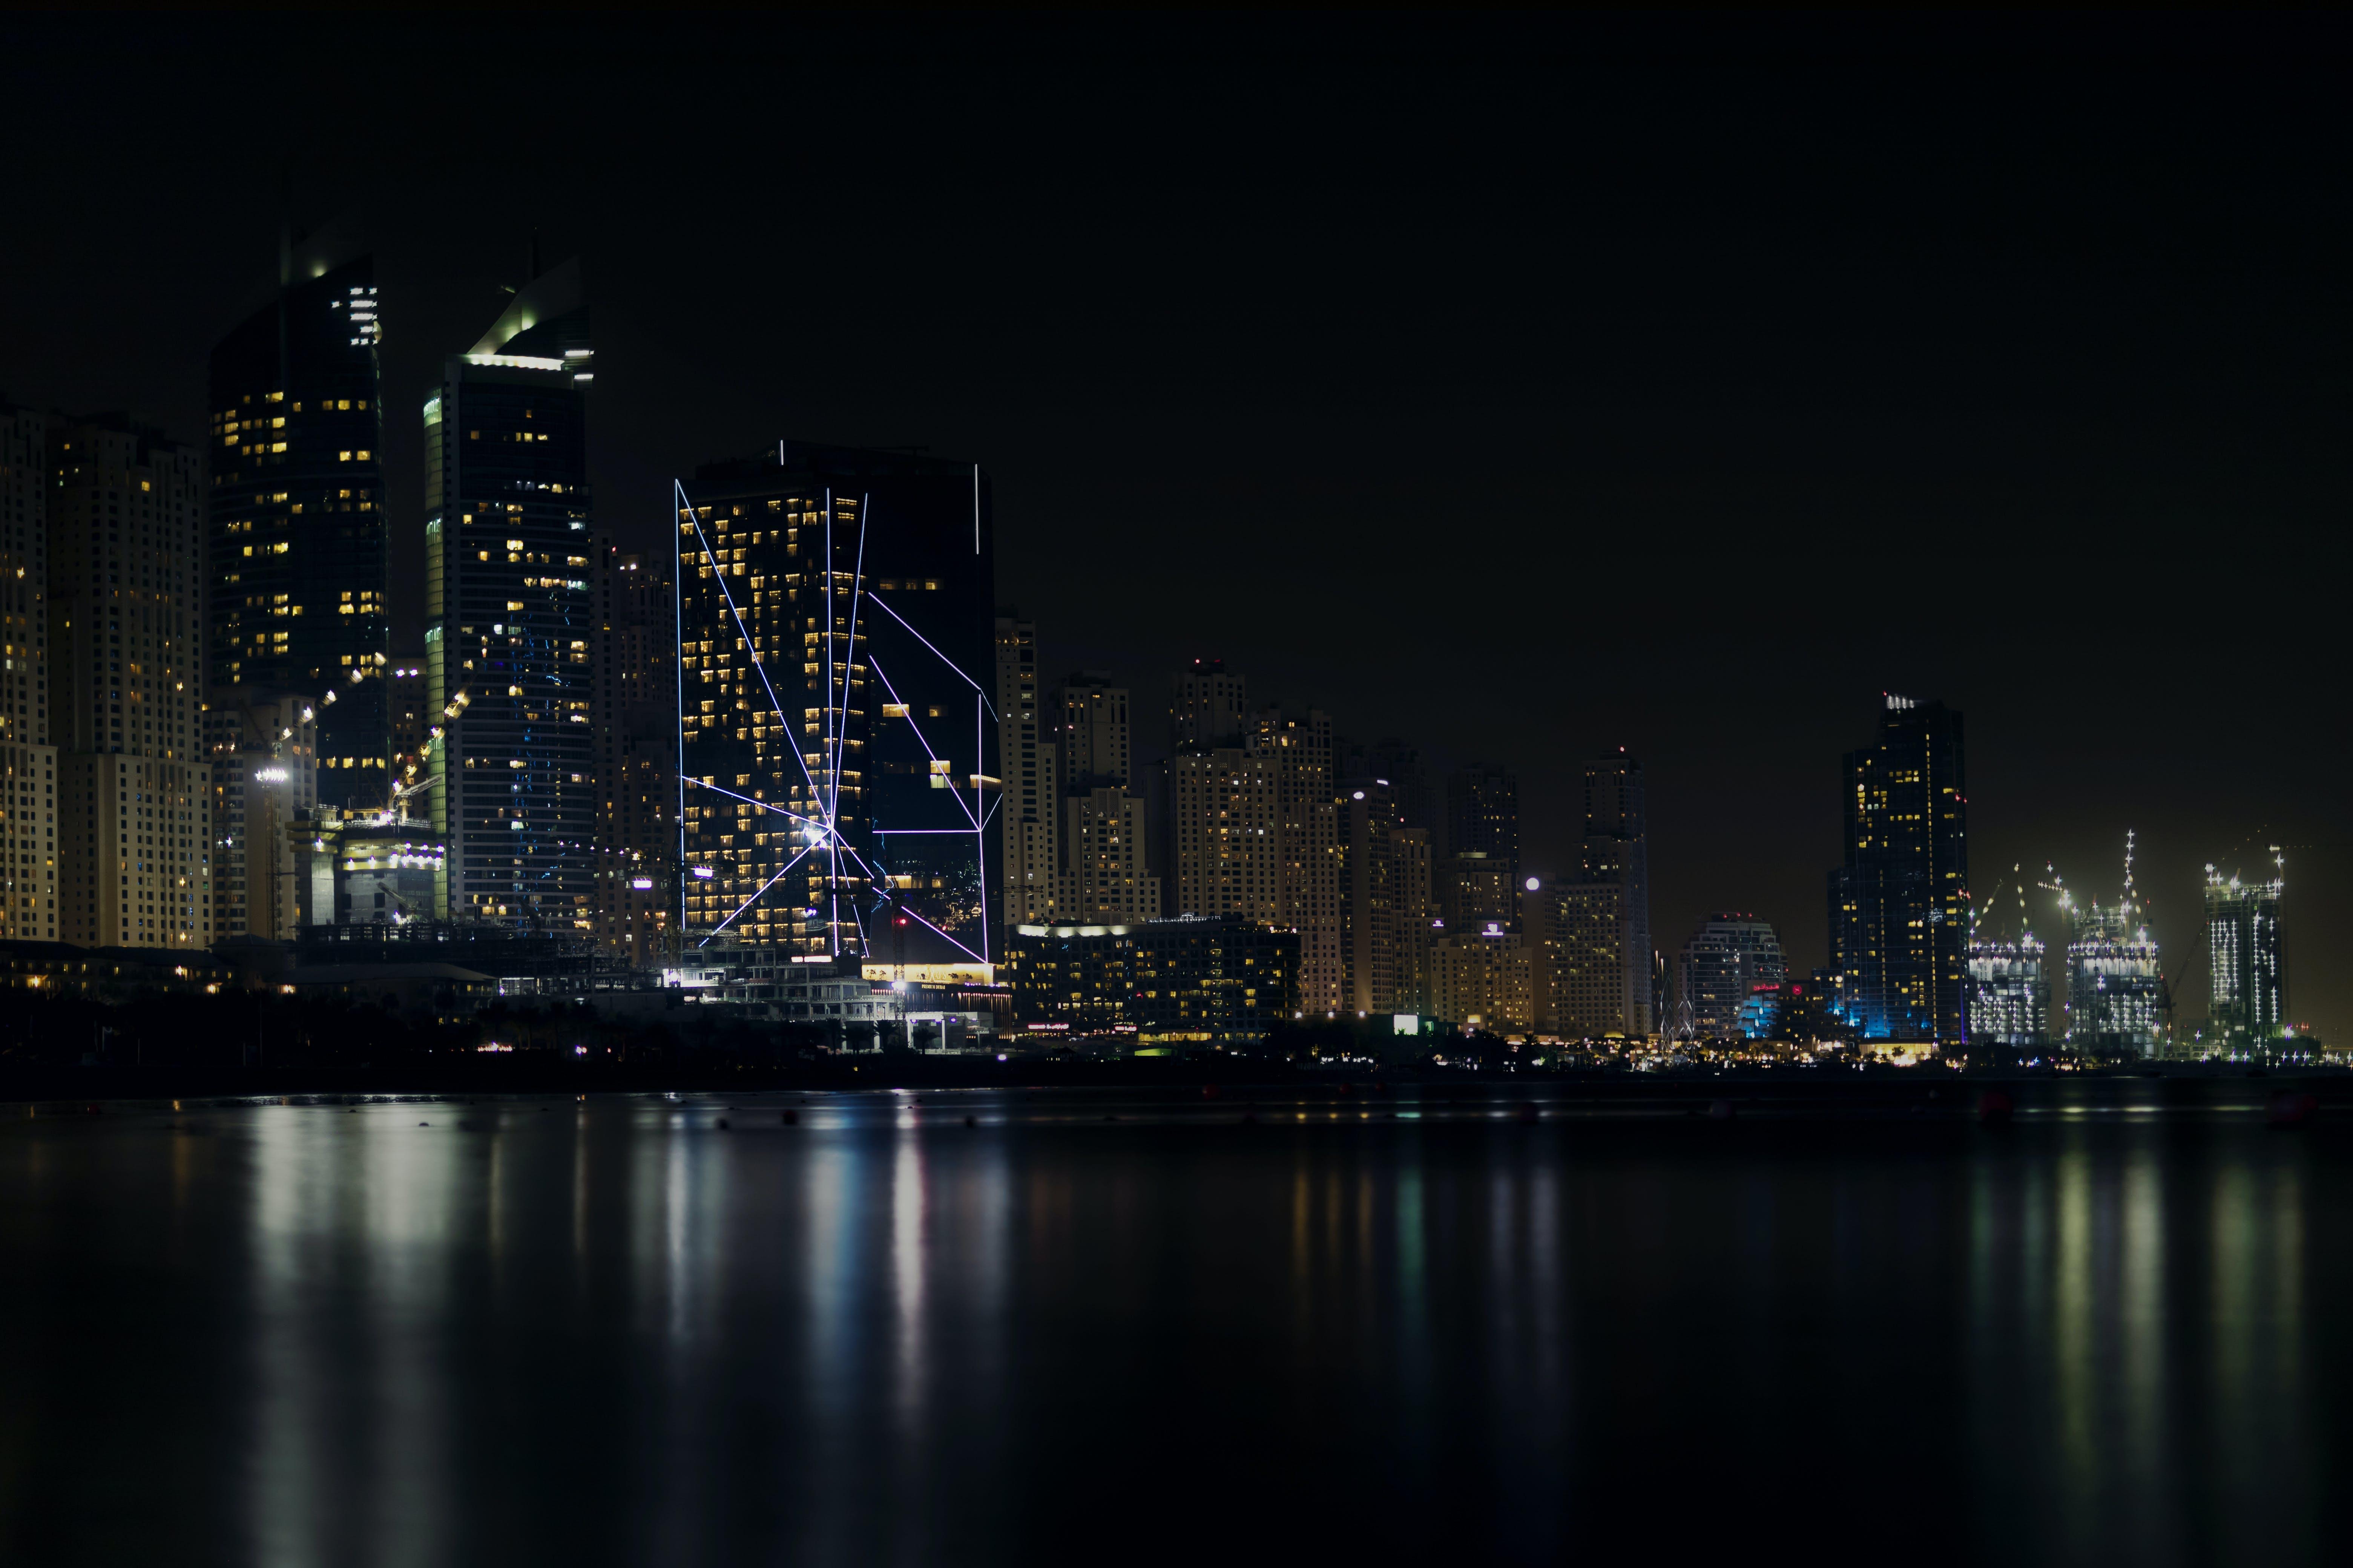 City Skyline Under Dark Sky